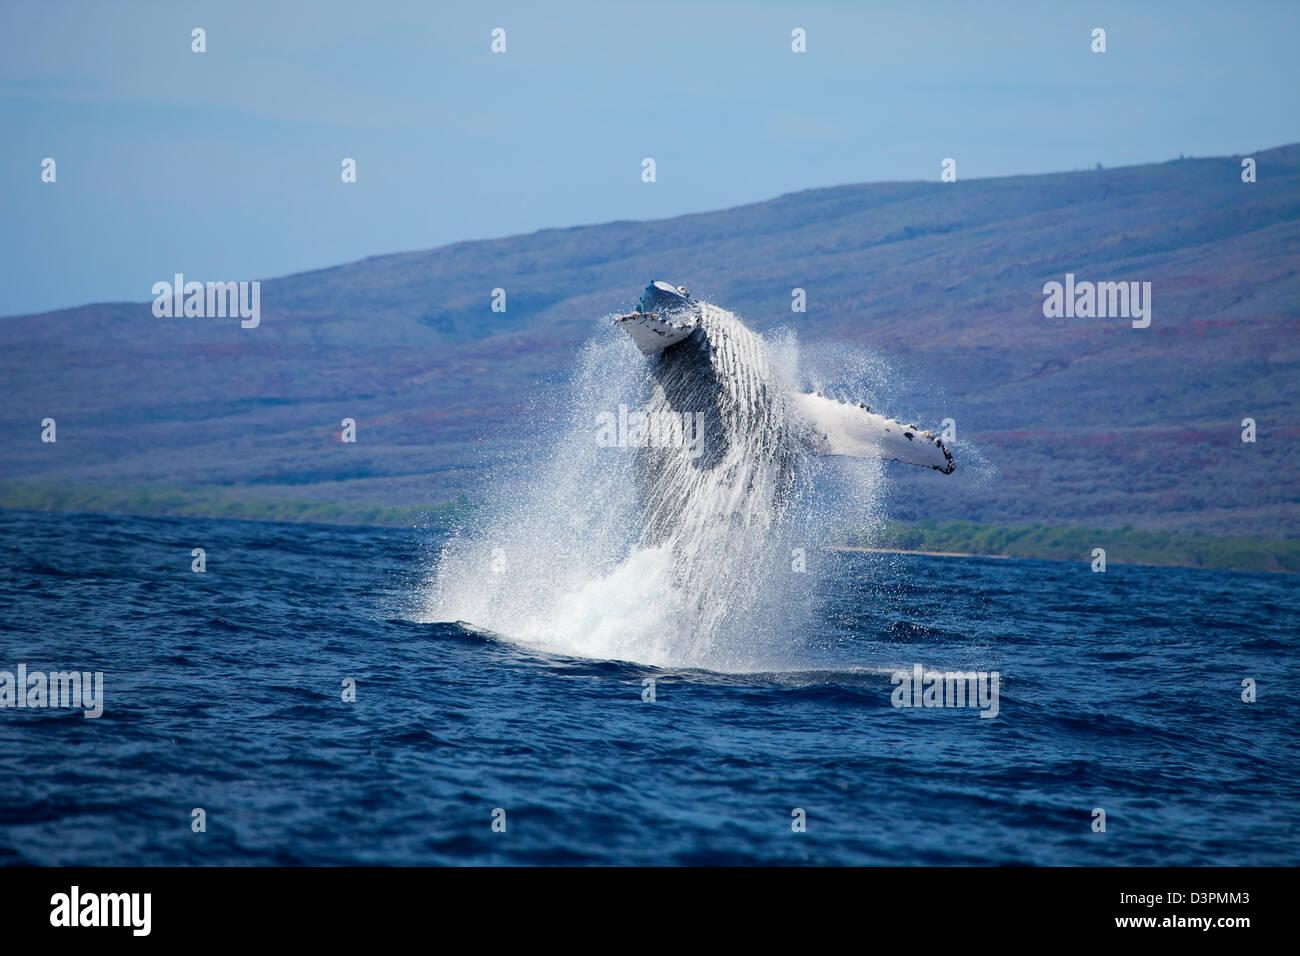 Breaching humpback whale, Megaptera novaeangliae, Hawaii. - Stock Image